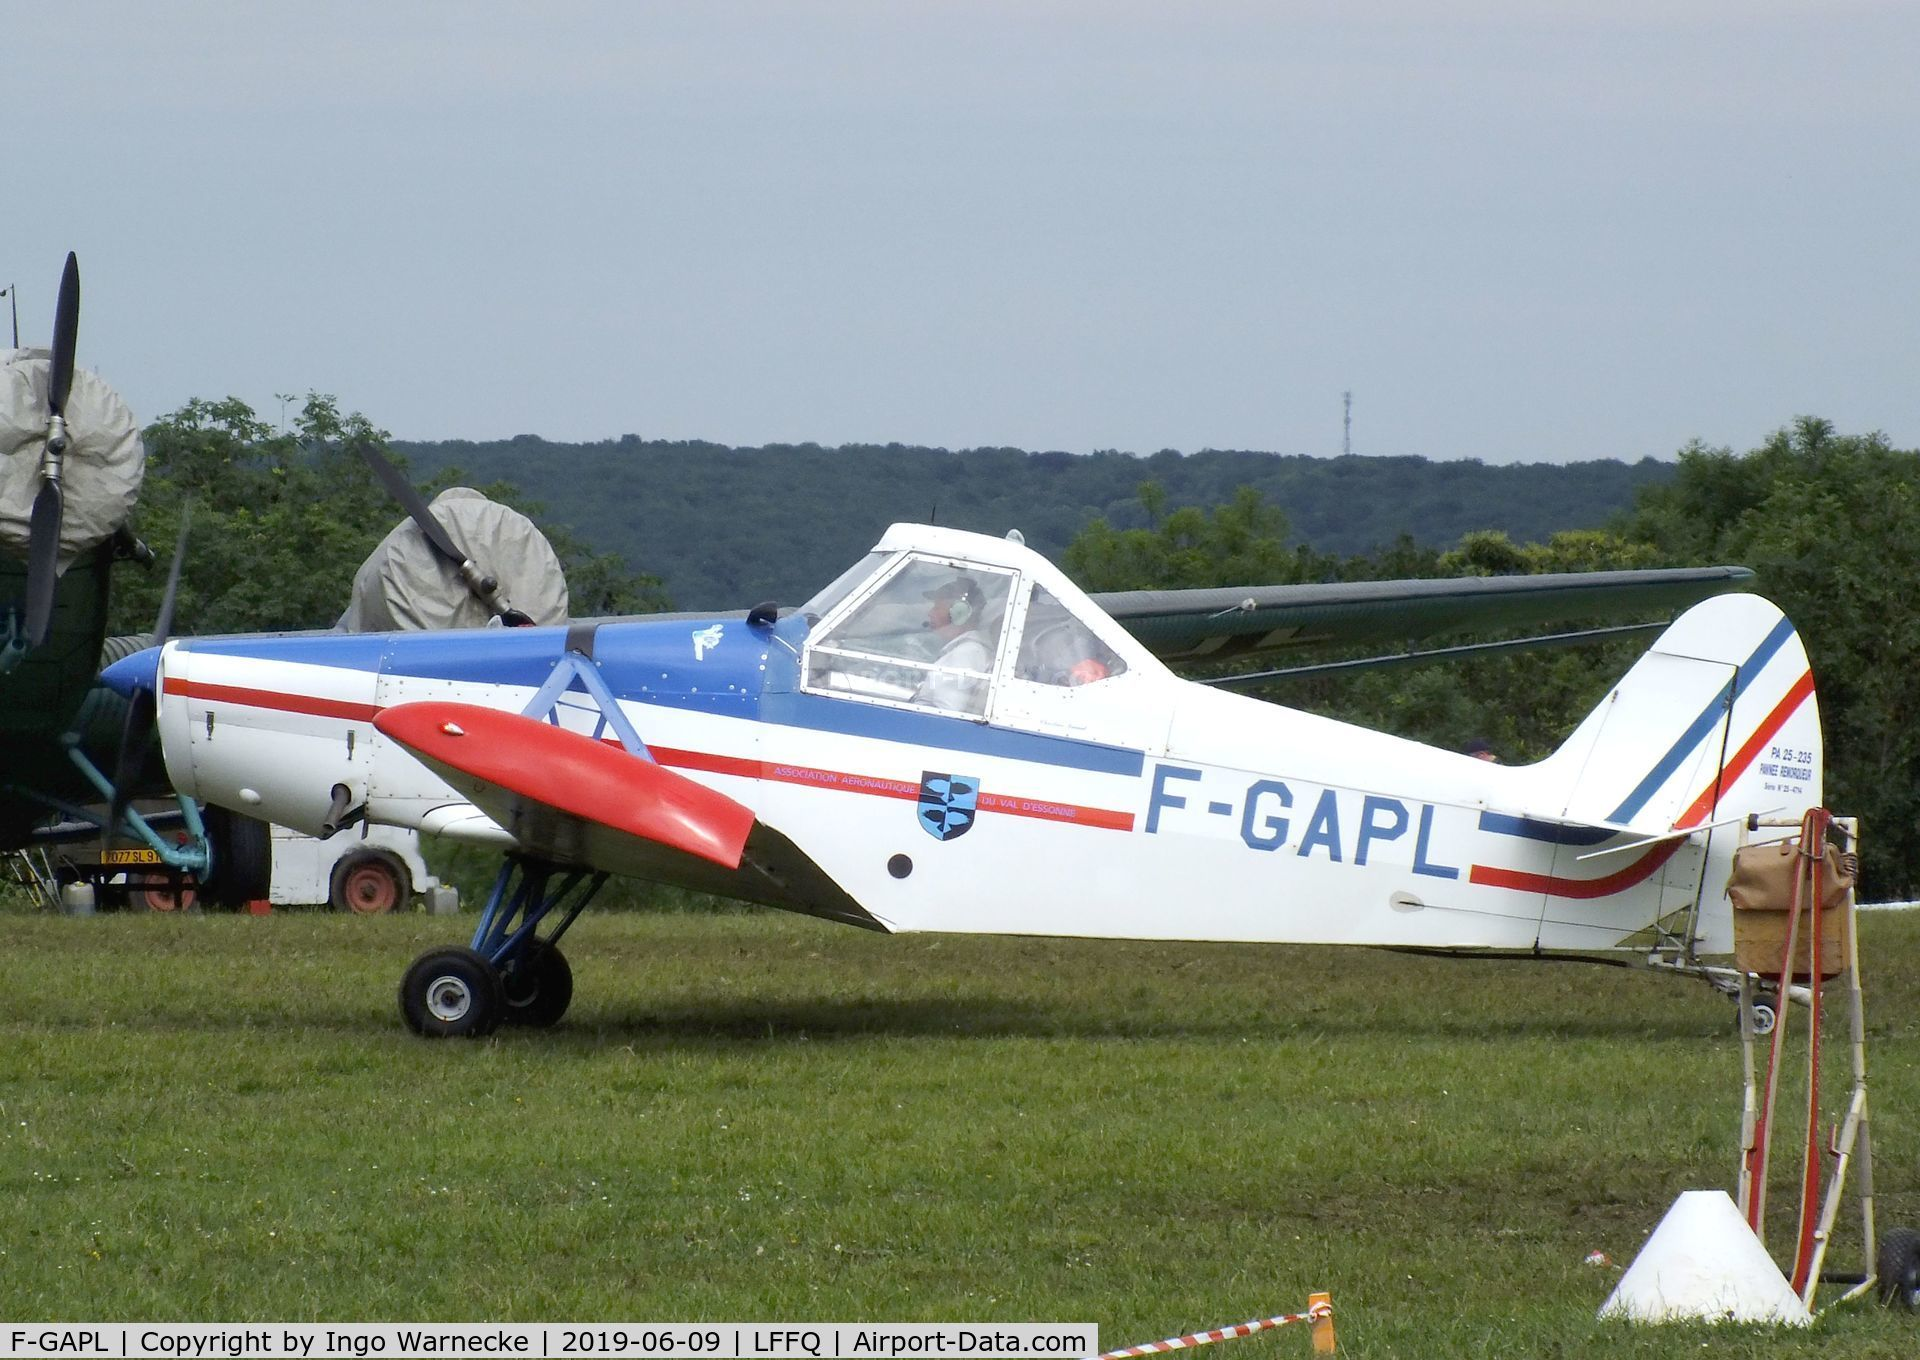 F-GAPL, Piper PA-25-235 Pawnee C/N 25-4714, Piper PA-25-235 Pawnee at the Meeting Aerien 2019, La-Ferte-Alais